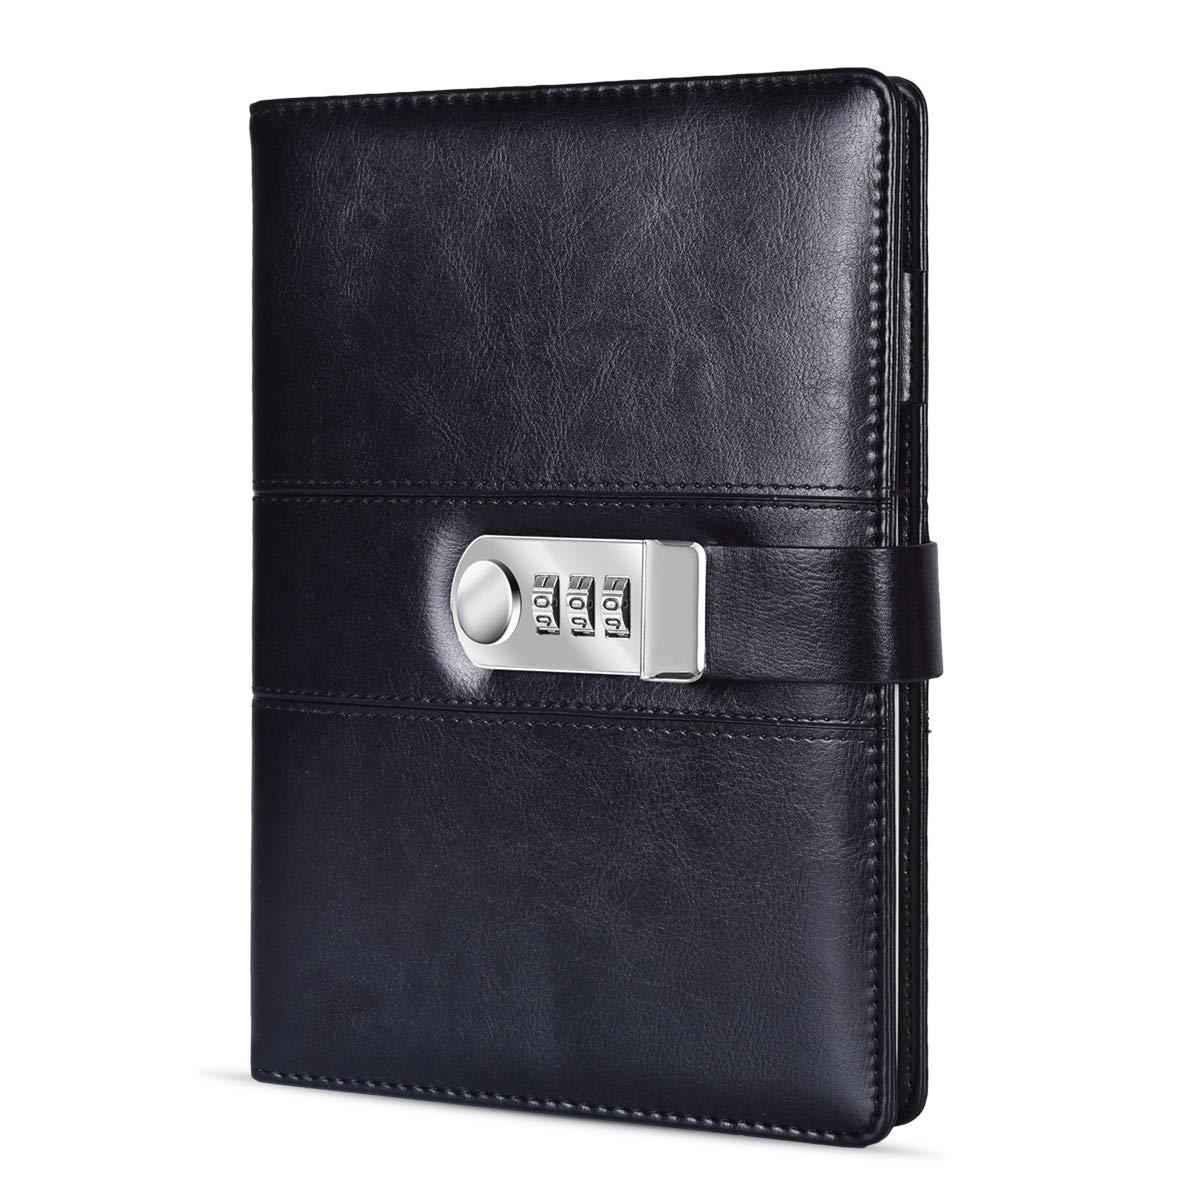 ARRLSDB A5 PU Leather Diary with Lock, Journal with Combination Lock Password Journal Locking Journal Diary (Black) by ARRLSDB